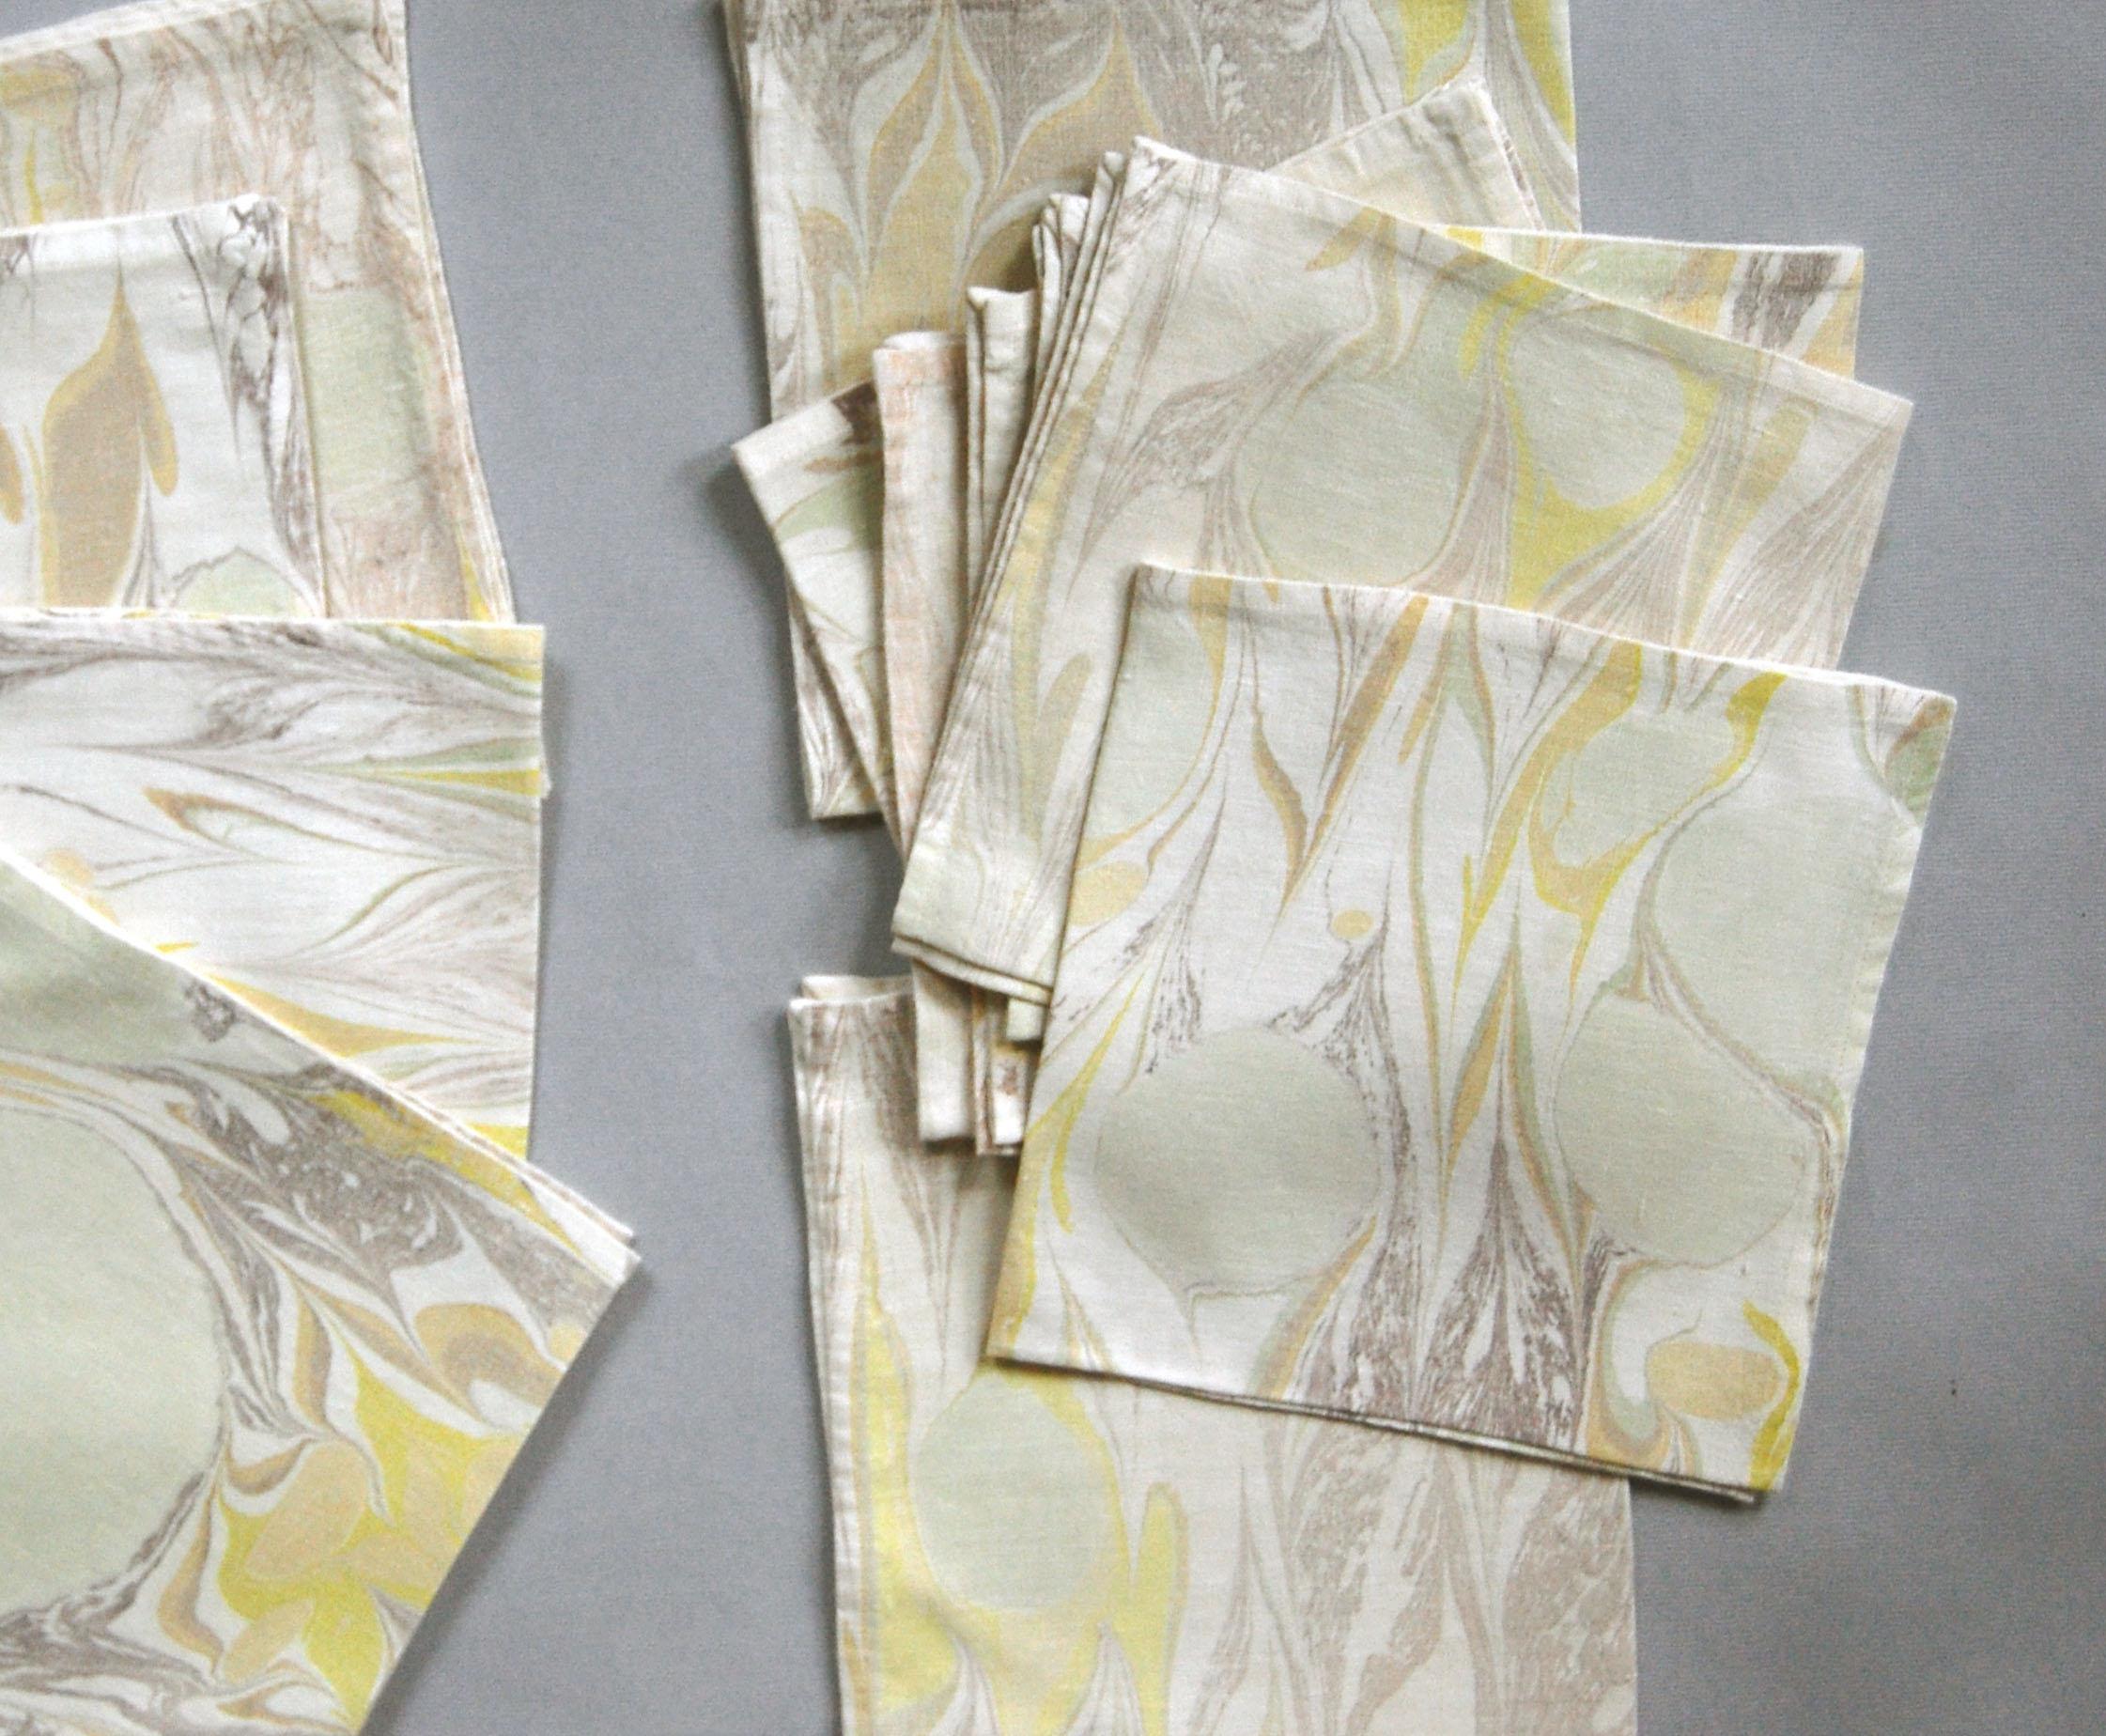 fabric marbling